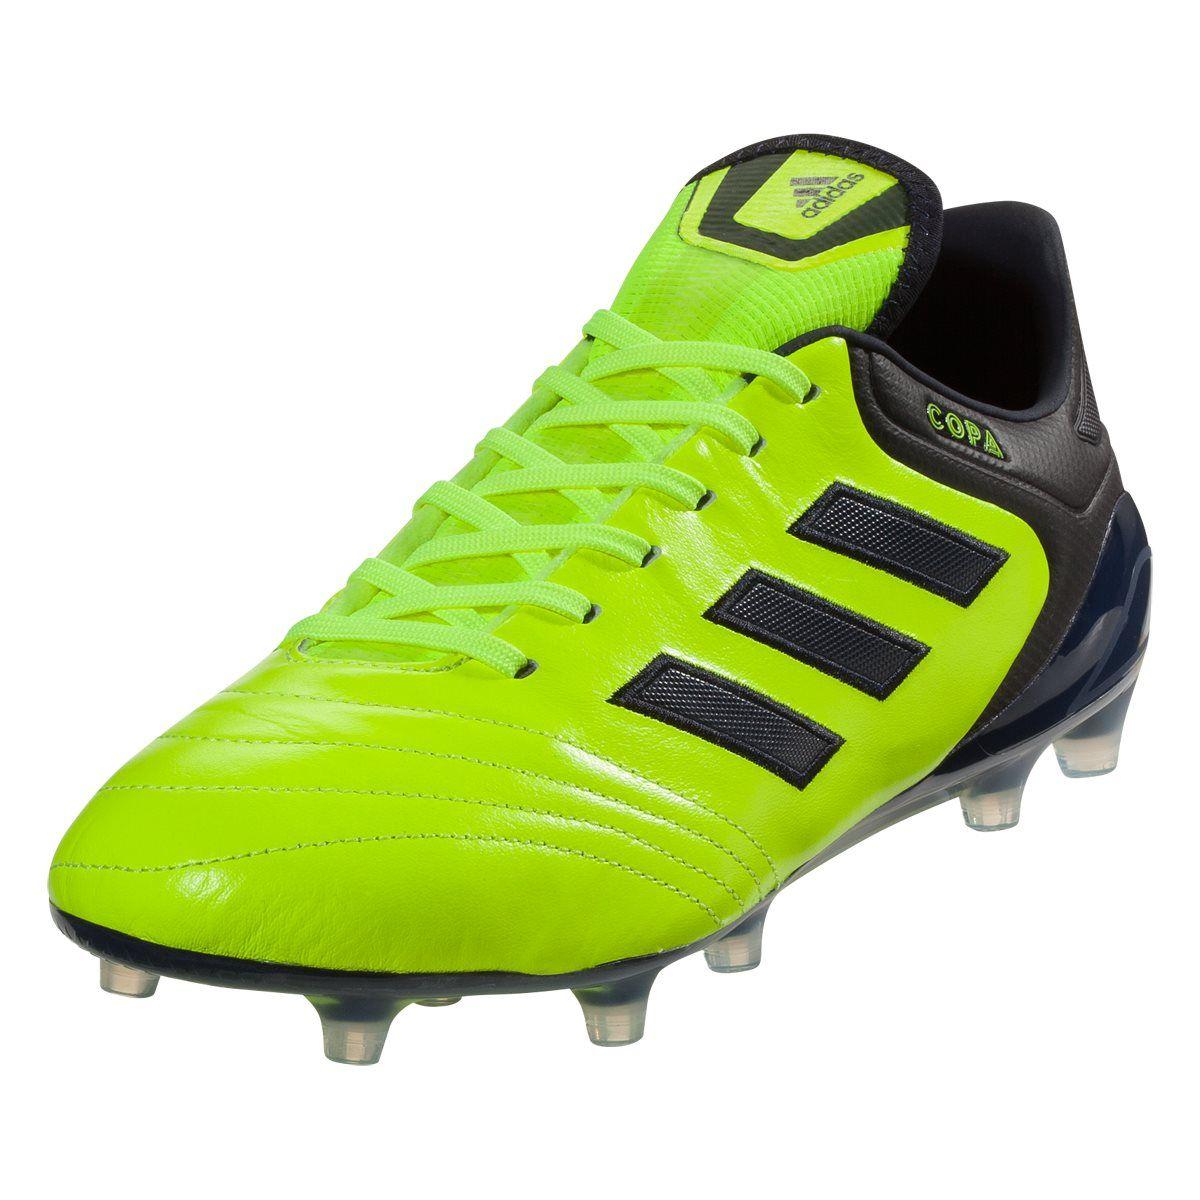 Fg 17 Copa Storm Adidas Soccer 1 Pack Cleats Chivas Ocean 4qIAIZgwY